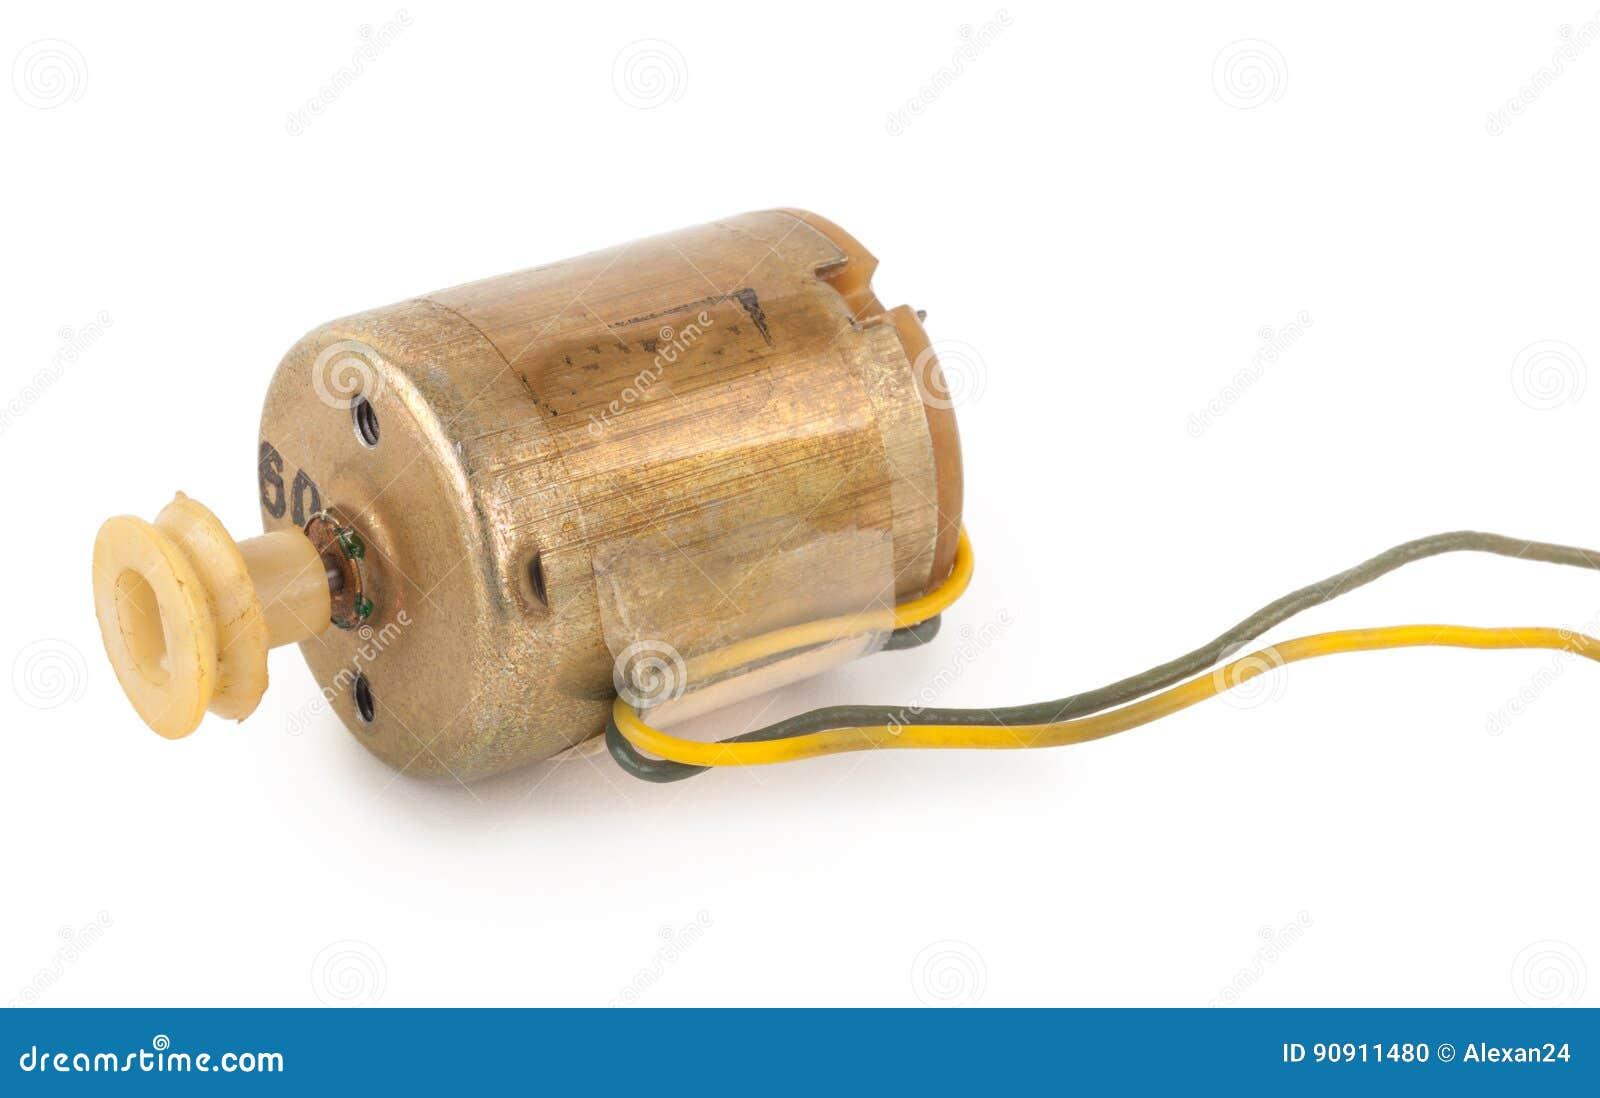 Kleiner Elektromotor